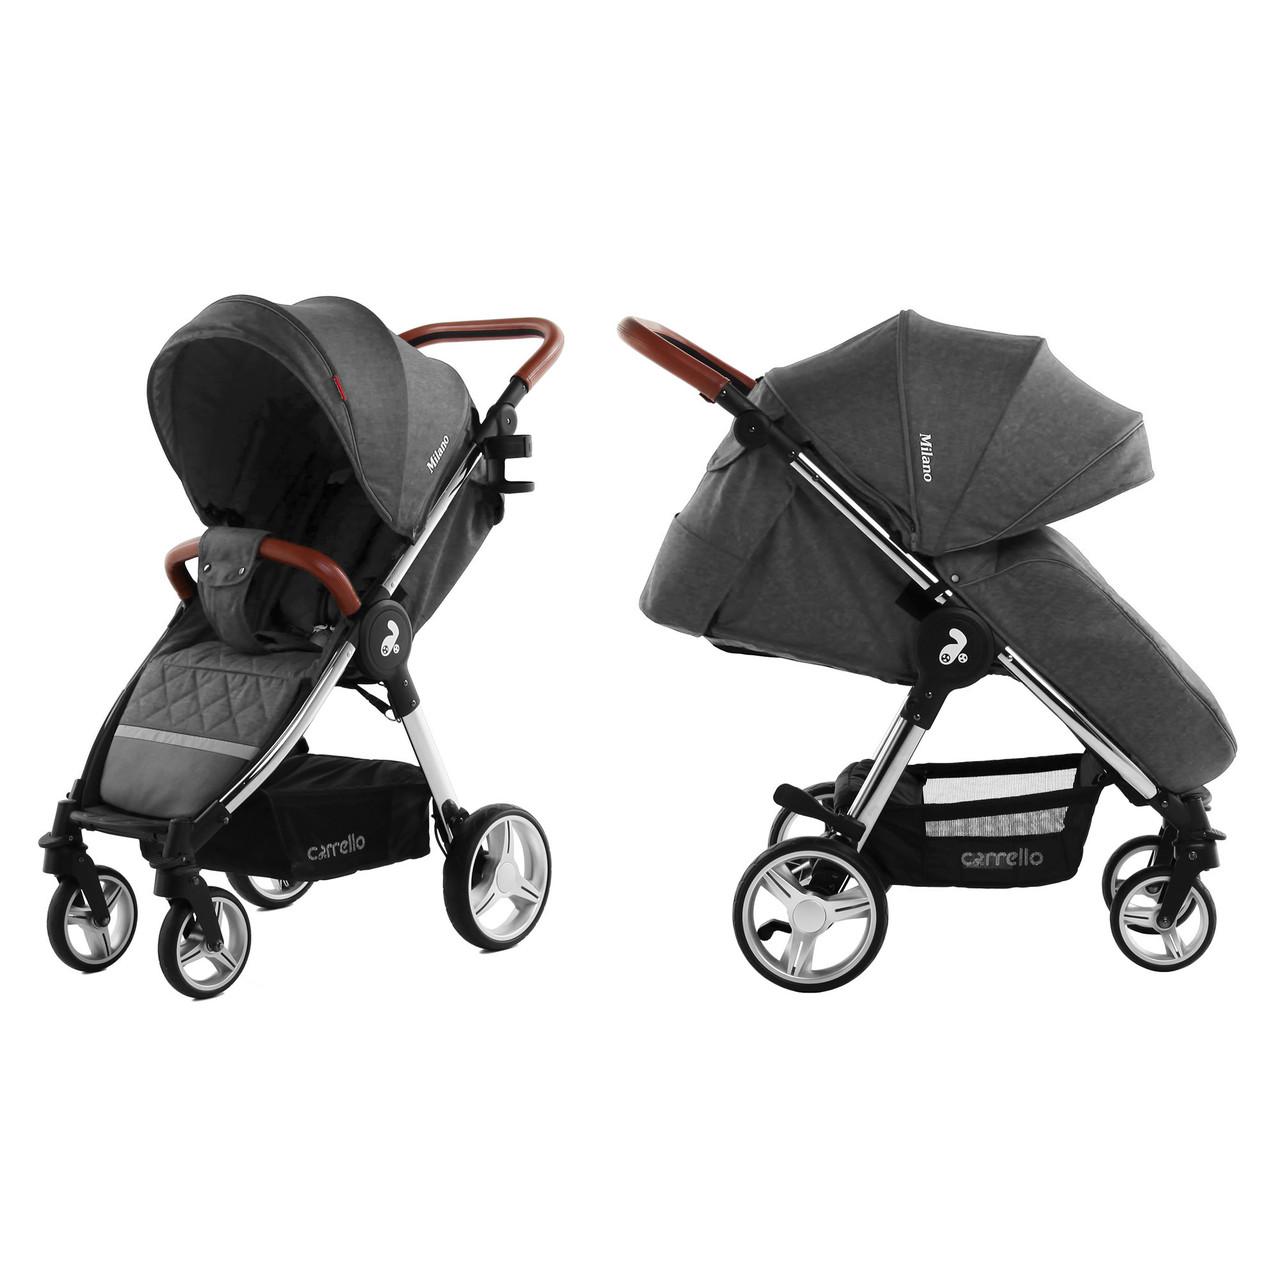 Коляска прогулочная CARRELLO Milano CRL-5501 Solid Grey Ухти-Тухти Кривой Рог